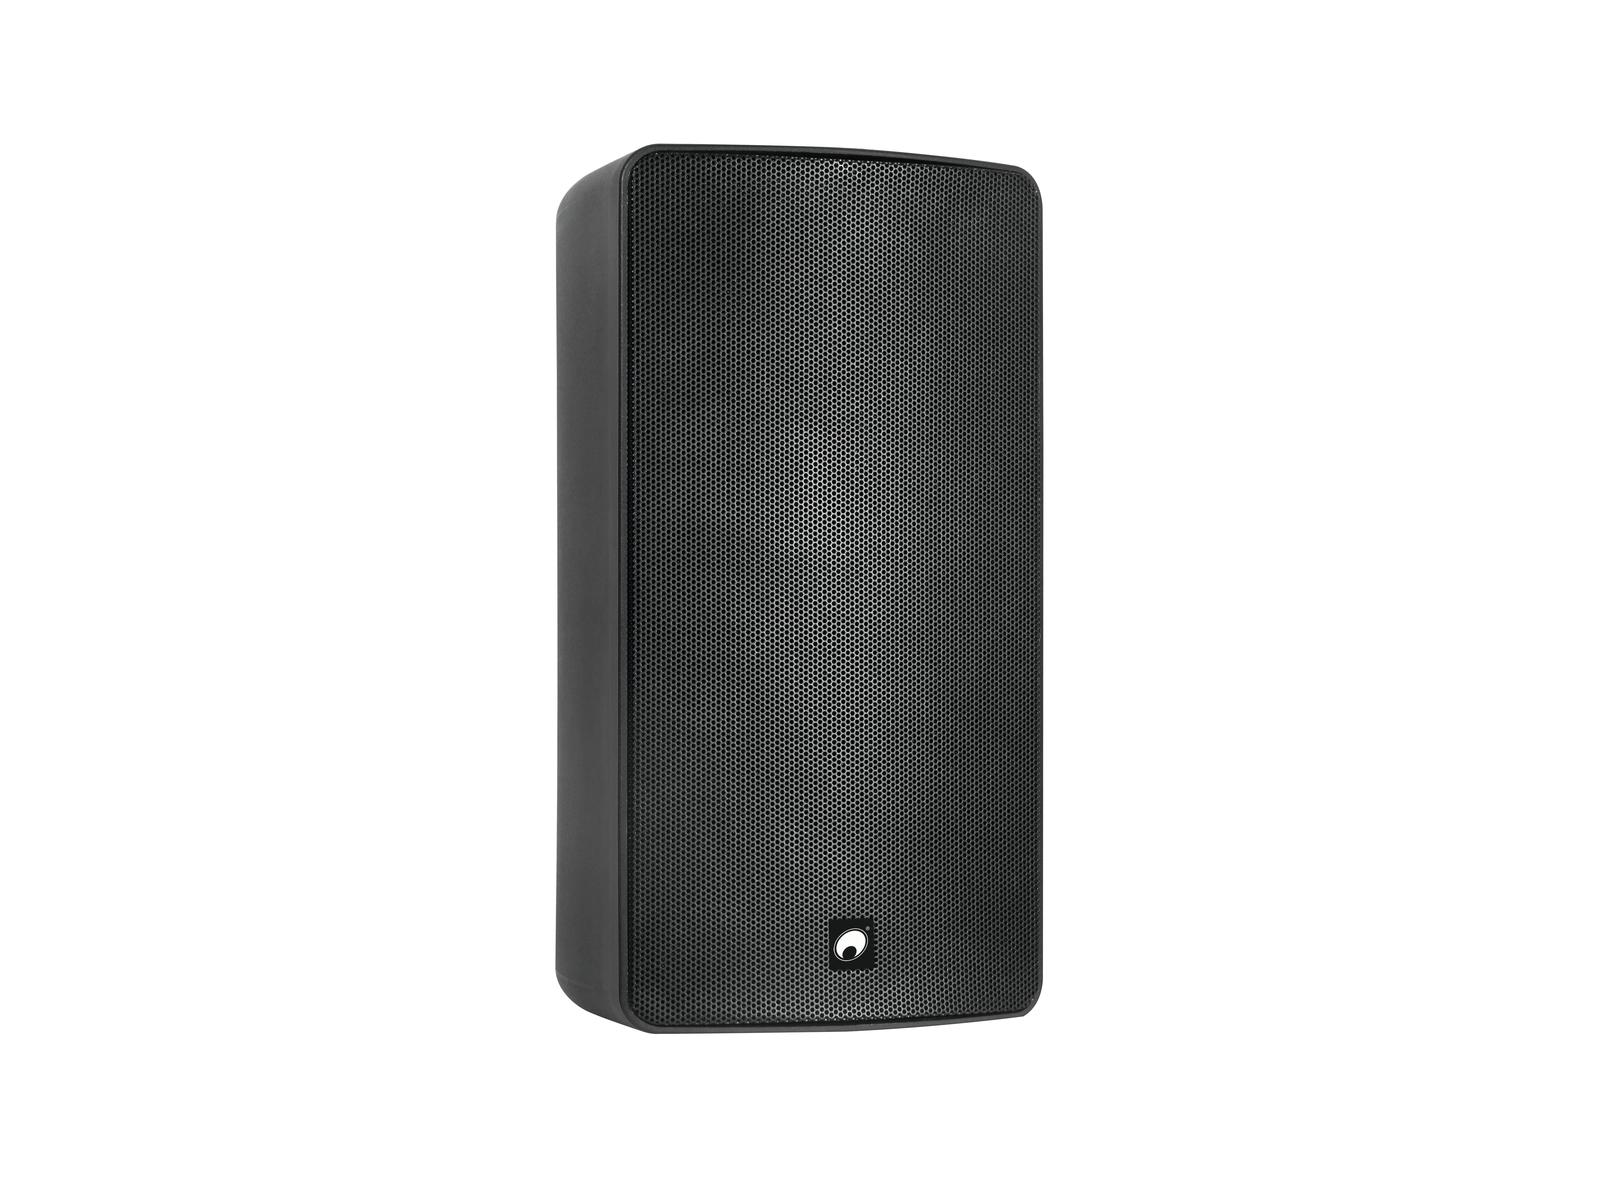 OMNITRONIC ODP-208 Installationslautsprecher 16 Ohm schwarz